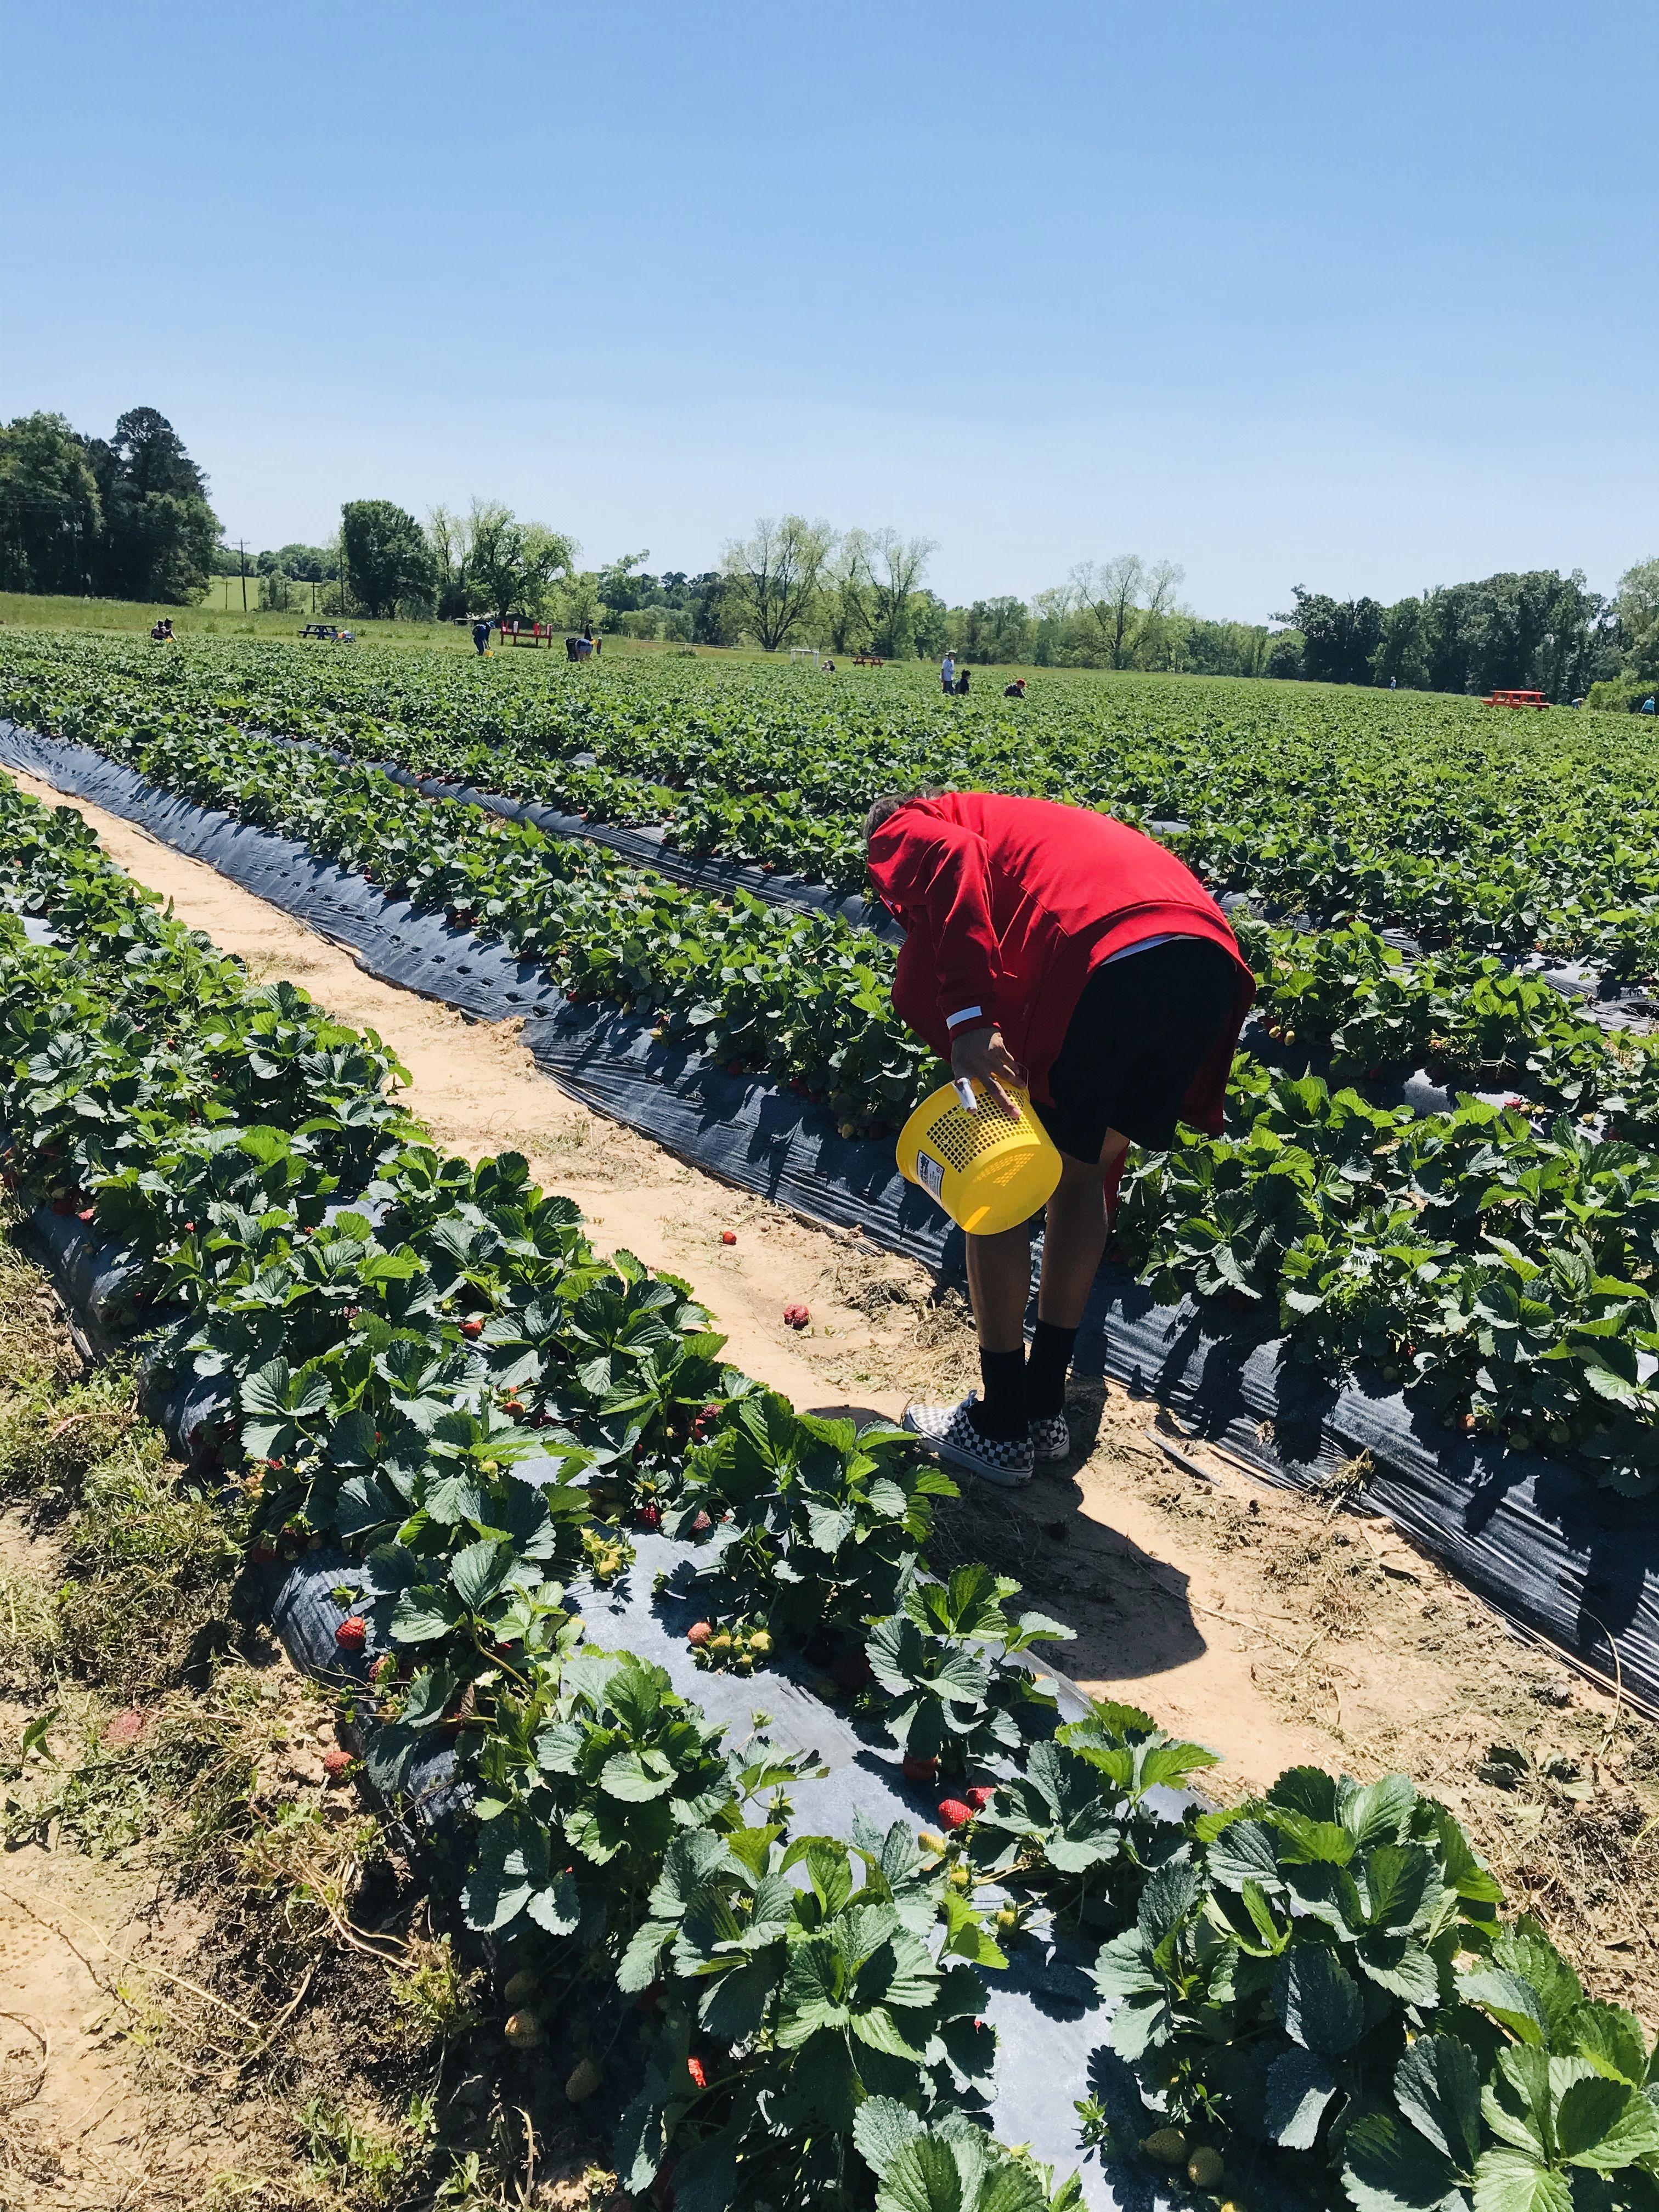 #vero #qualitytime #son #strawberry #picking